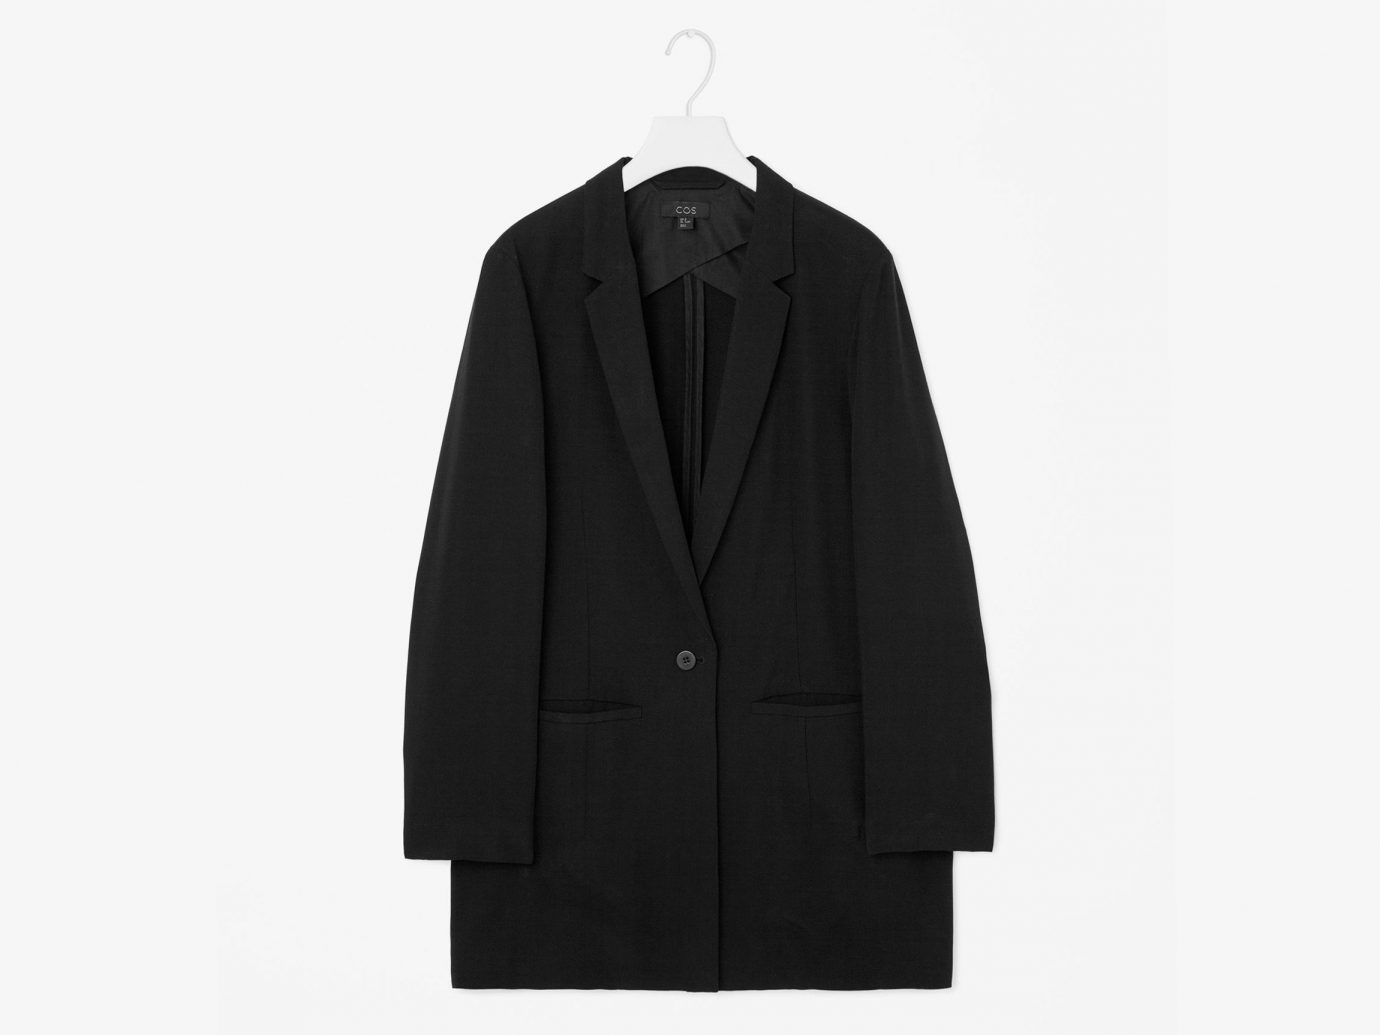 Style + Design clothing suit man coat outerwear overcoat sleeve formal wear wool jacket tuxedo collar pocket posing tan